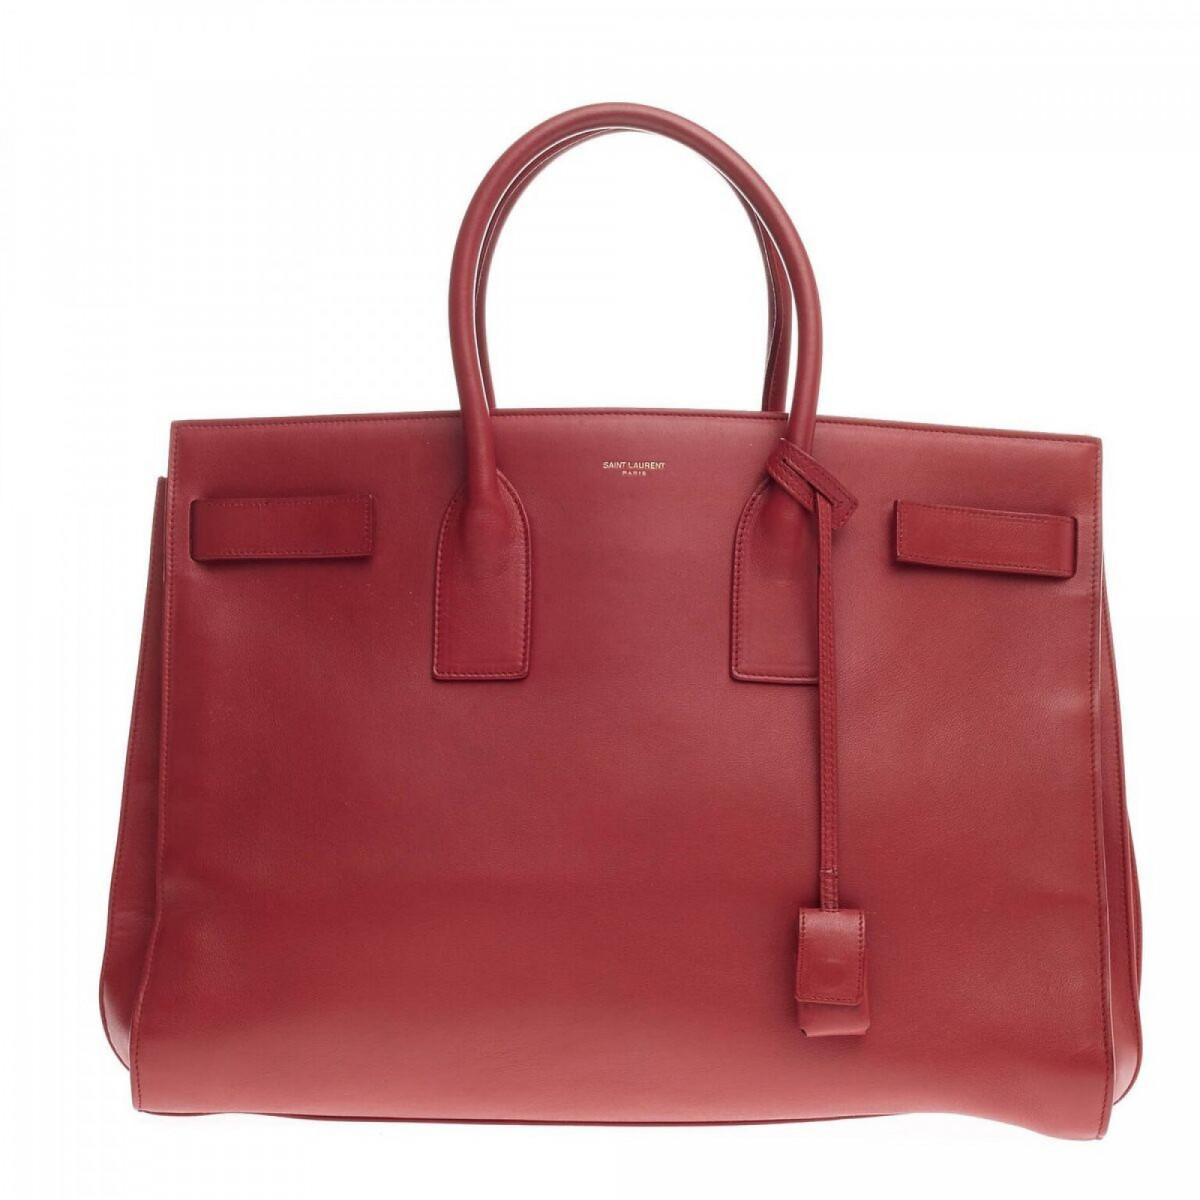 Yves Saint Laurent Handbags | Saint Laurent Low Top Sneakers | Saint Laurent Mens Boots